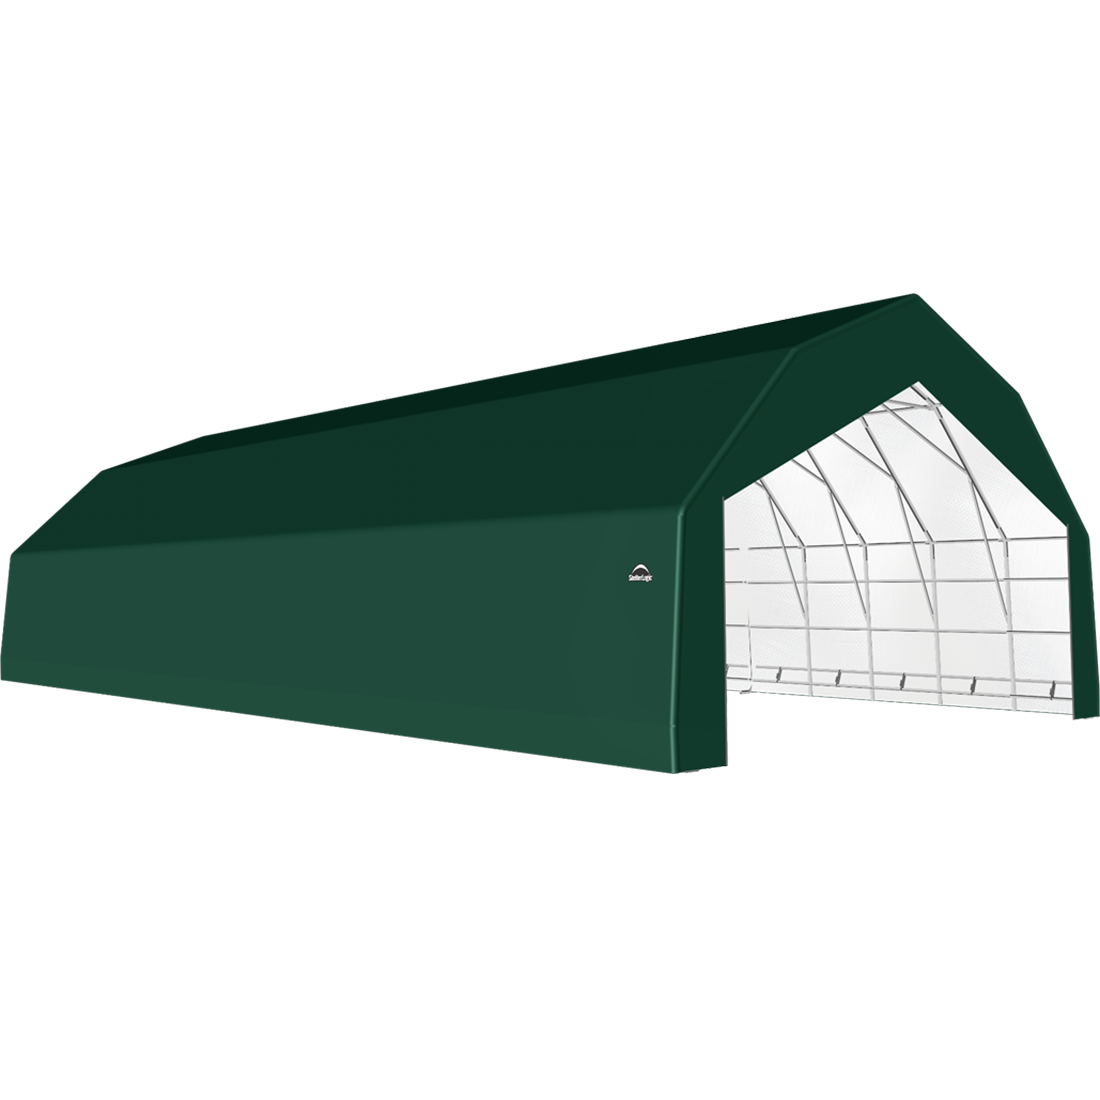 ShelterTech SP Series Barn Shelter, 30 ft. x 64 ft. x 18 ft. Heavy Duty PVC 14.5 oz. Green